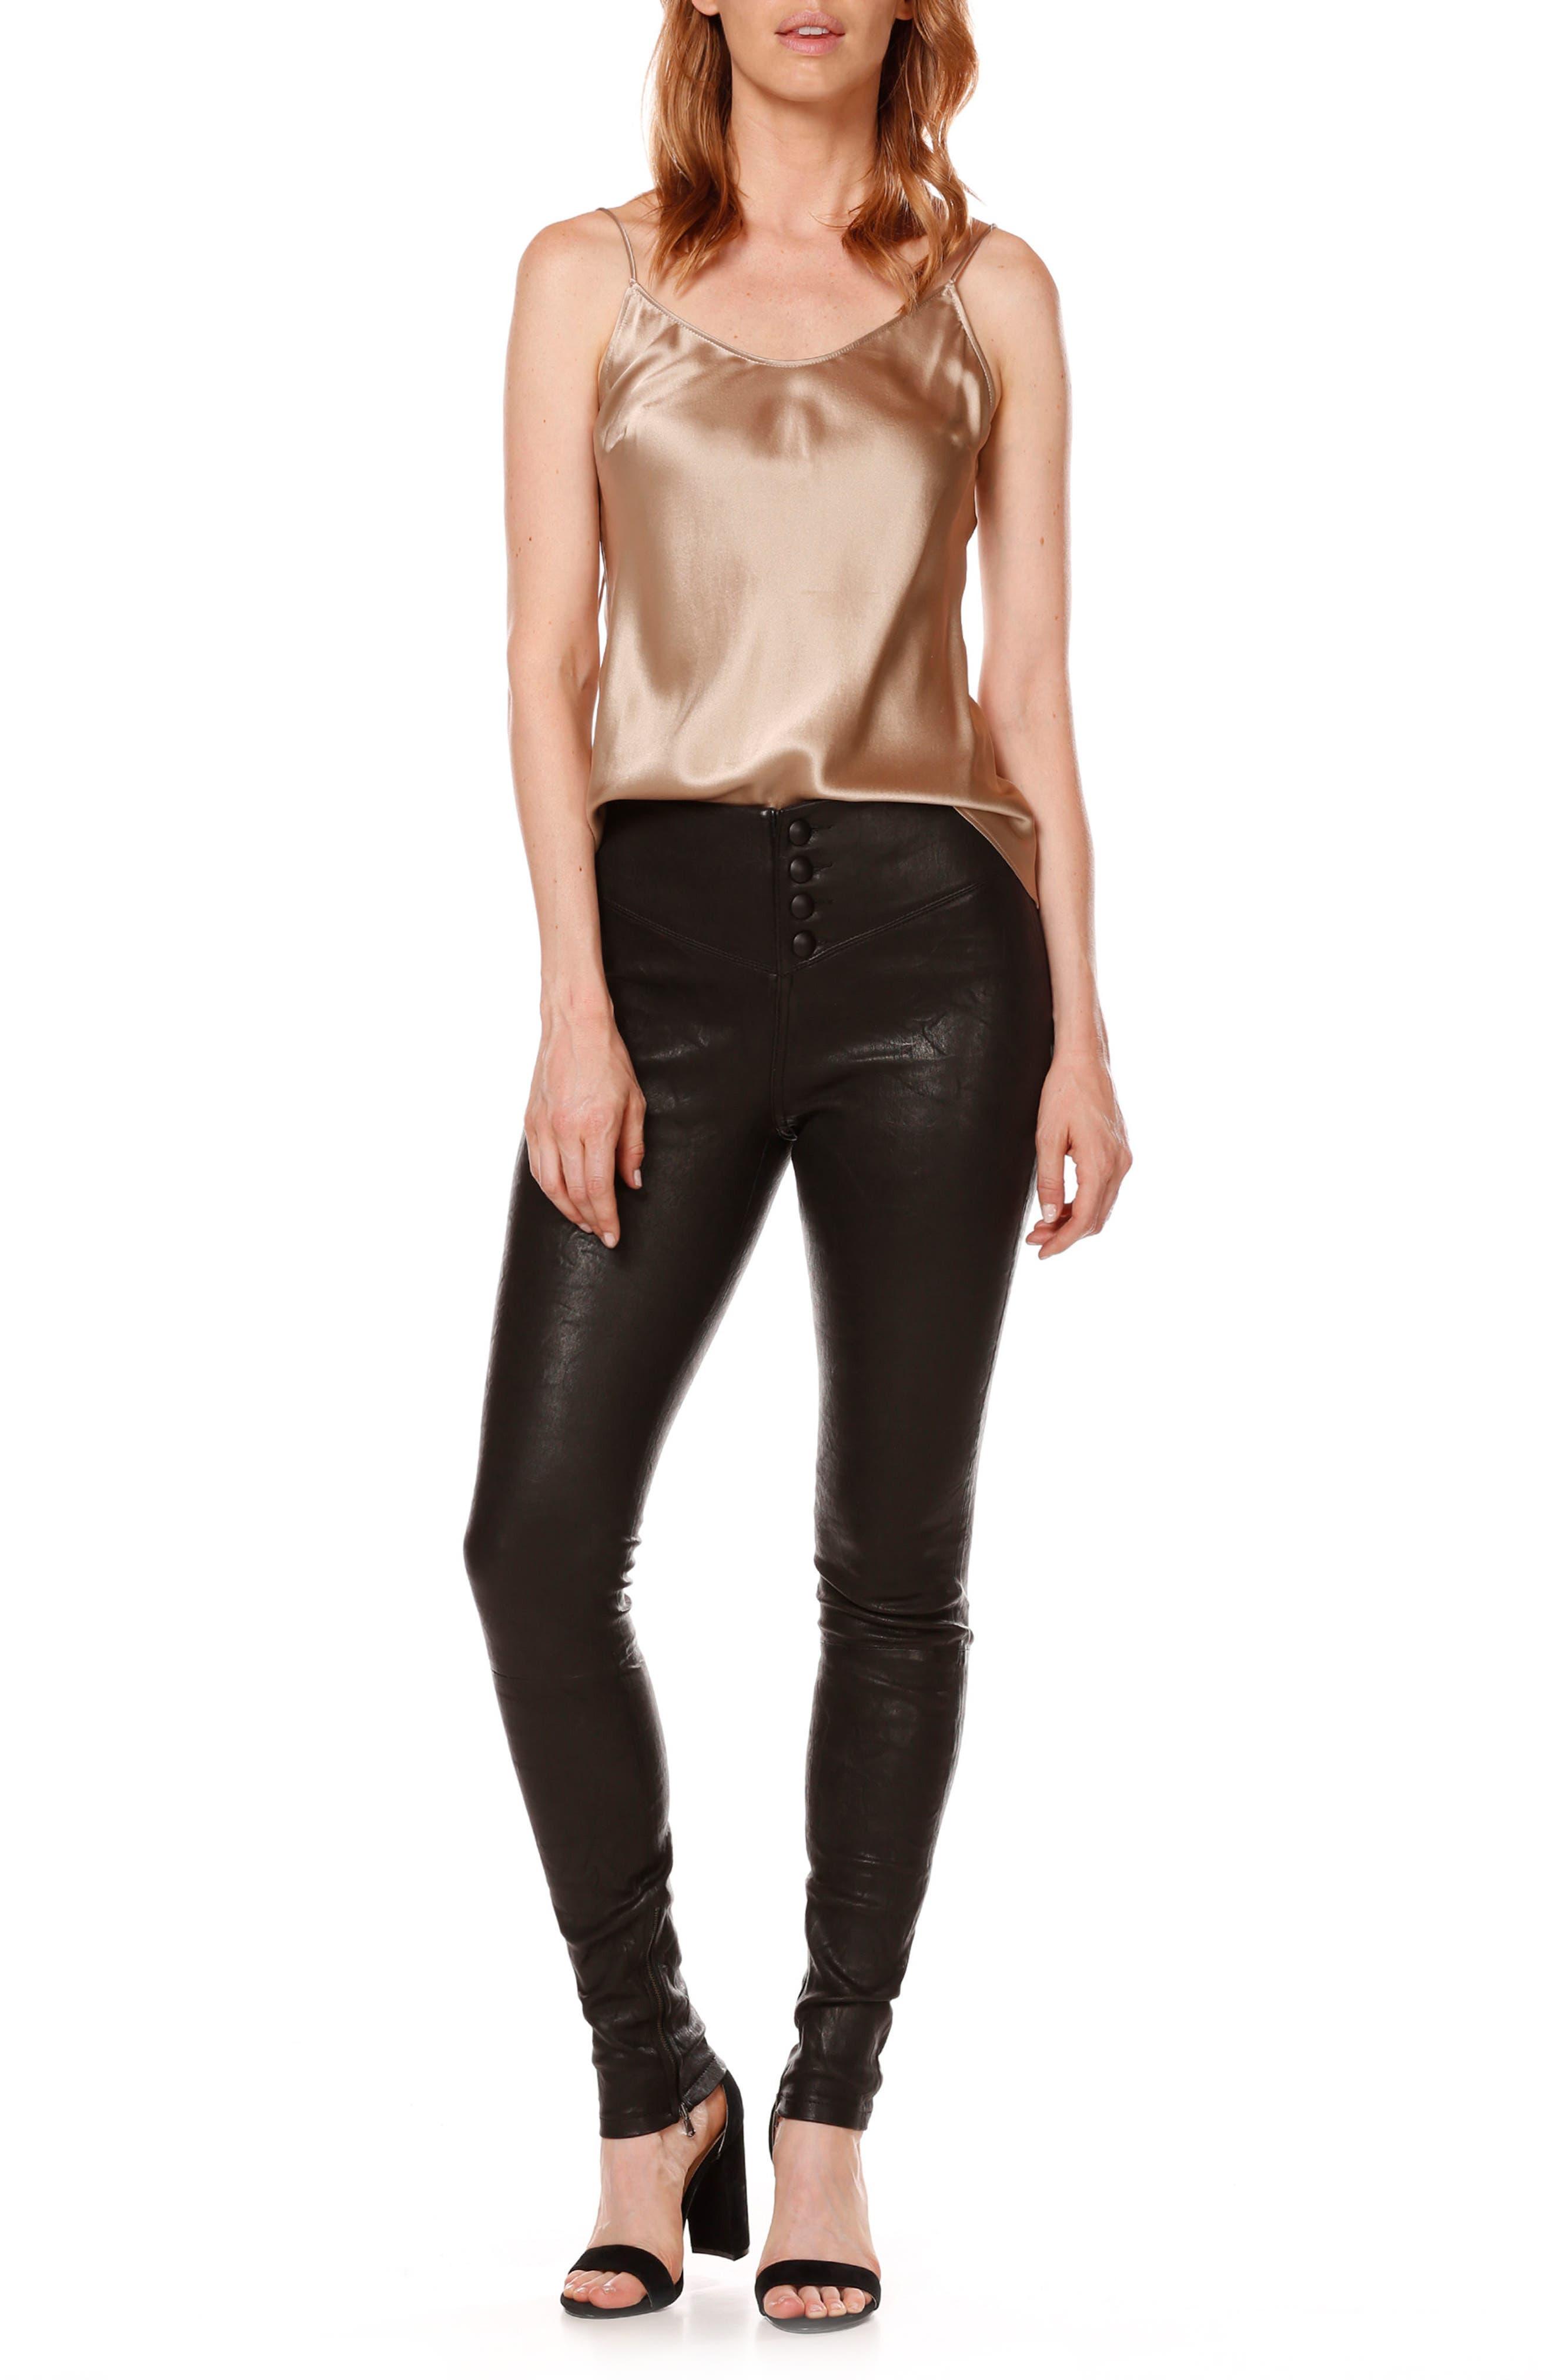 Rosie HW x PAIGE Ellery Ankle Zip Leather Pants,                             Alternate thumbnail 3, color,                             001